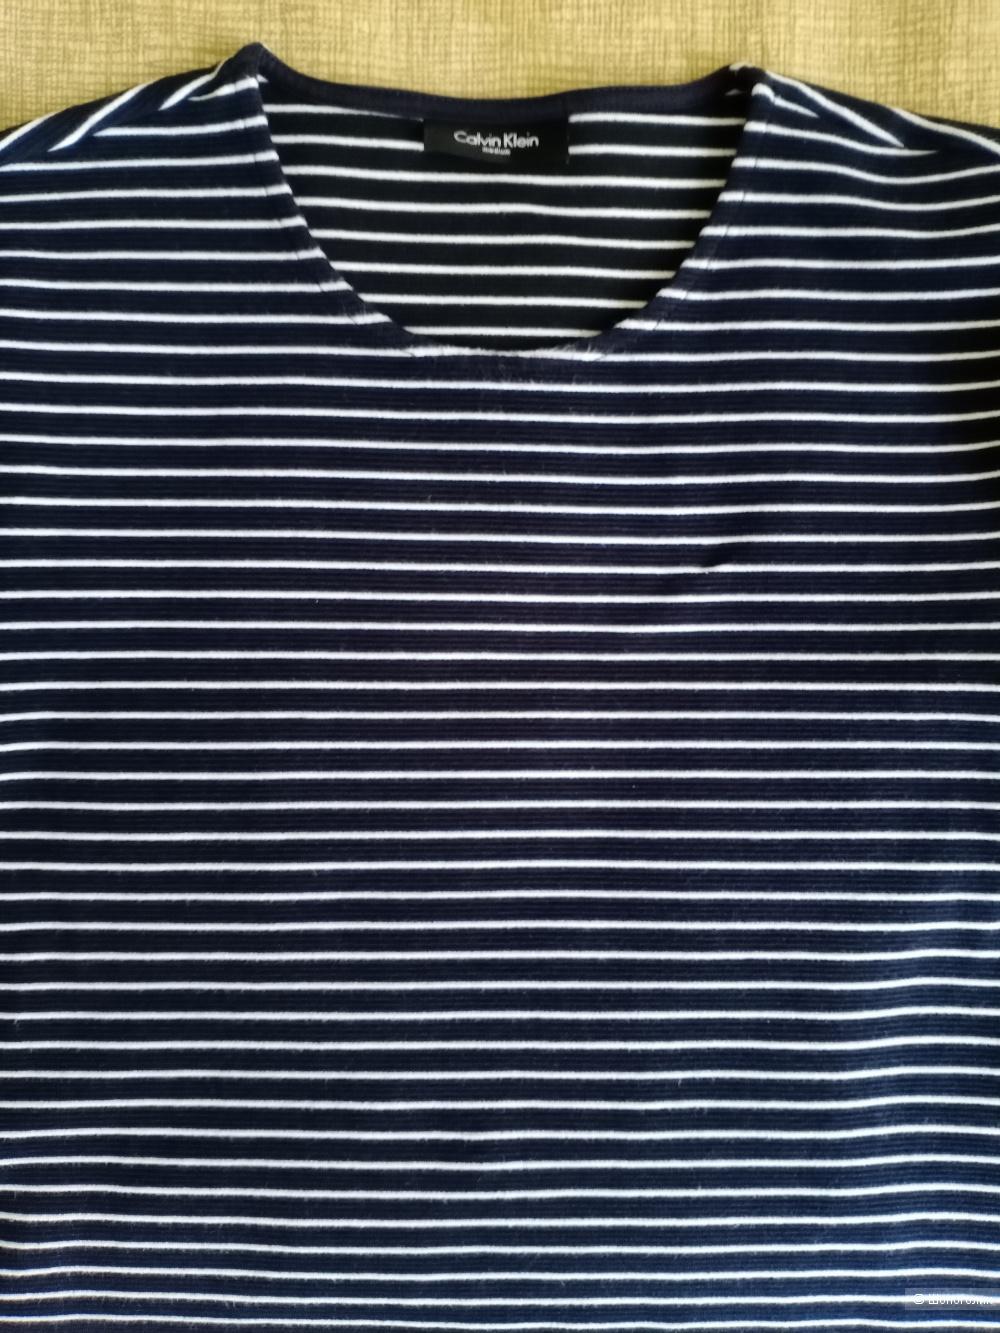 Топ, футболка Kevin Kline, 46-48